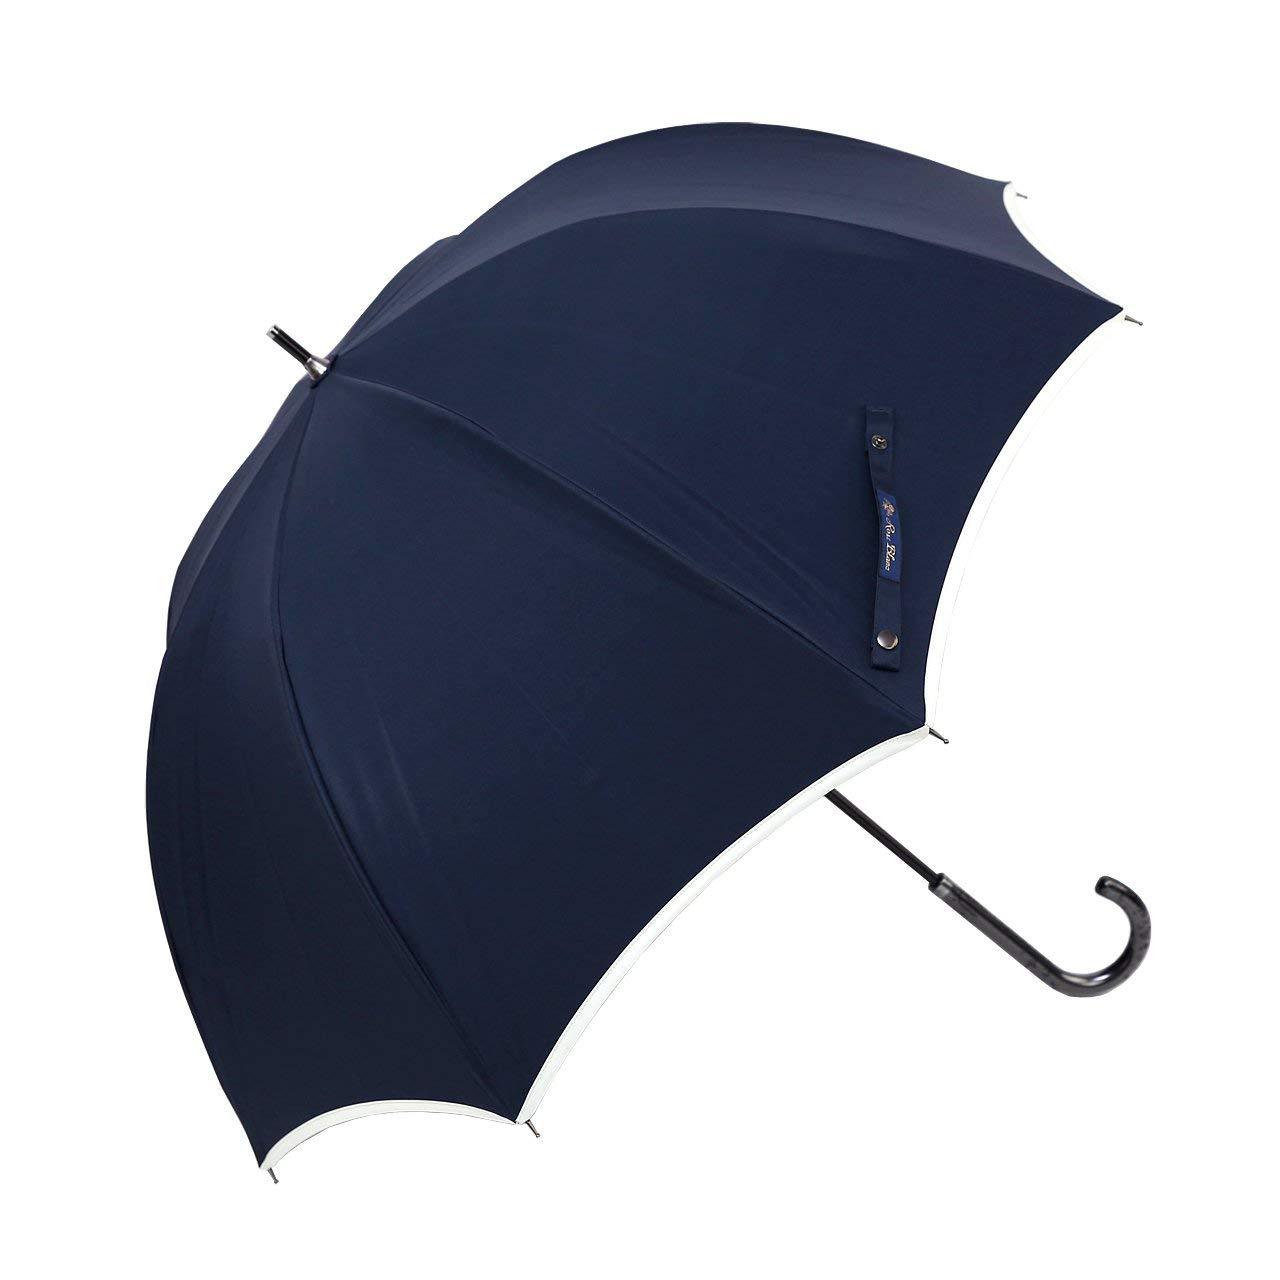 【Rose Blanc】100%完全遮光 晴雨兼用 涼感 パイピング ラージサイズ 60cm (ネイビー×アイボリー) B07PLSXGQL ネイビー×アイボリー